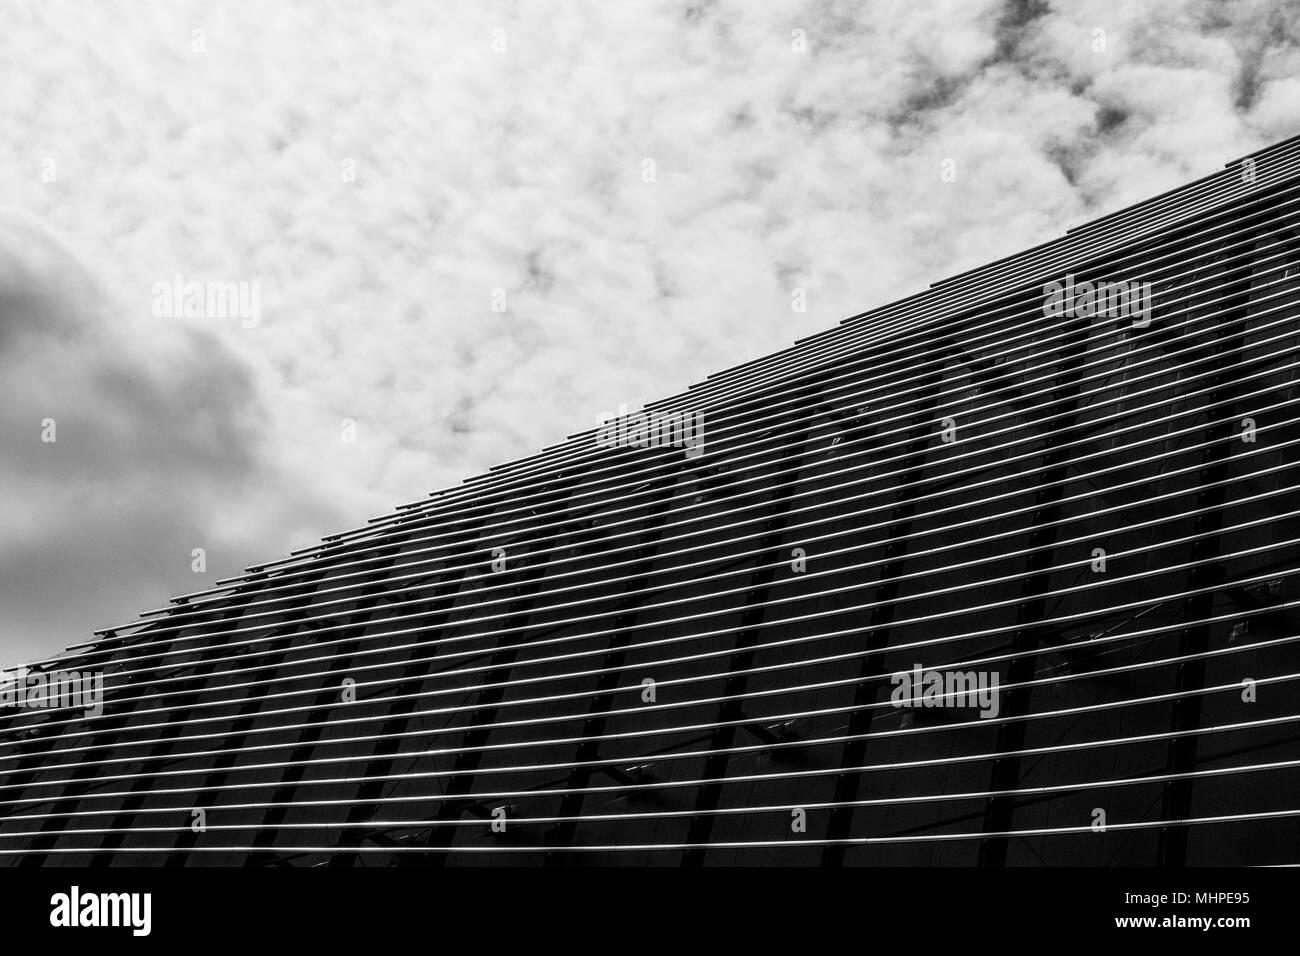 West Quay Shopping centre - Southampton UK - Stock Image